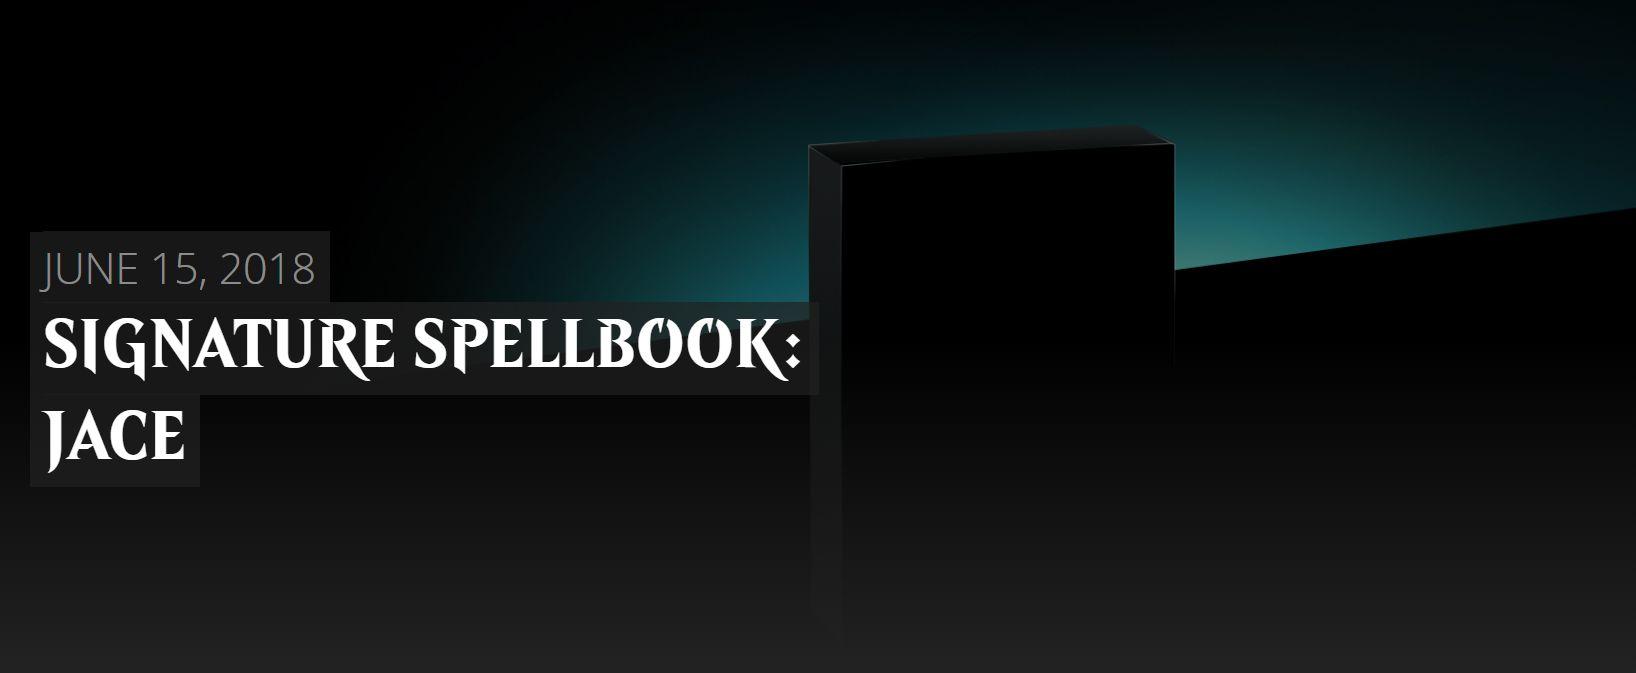 Signature Spellbook: Jace(2018年6月15日発売)